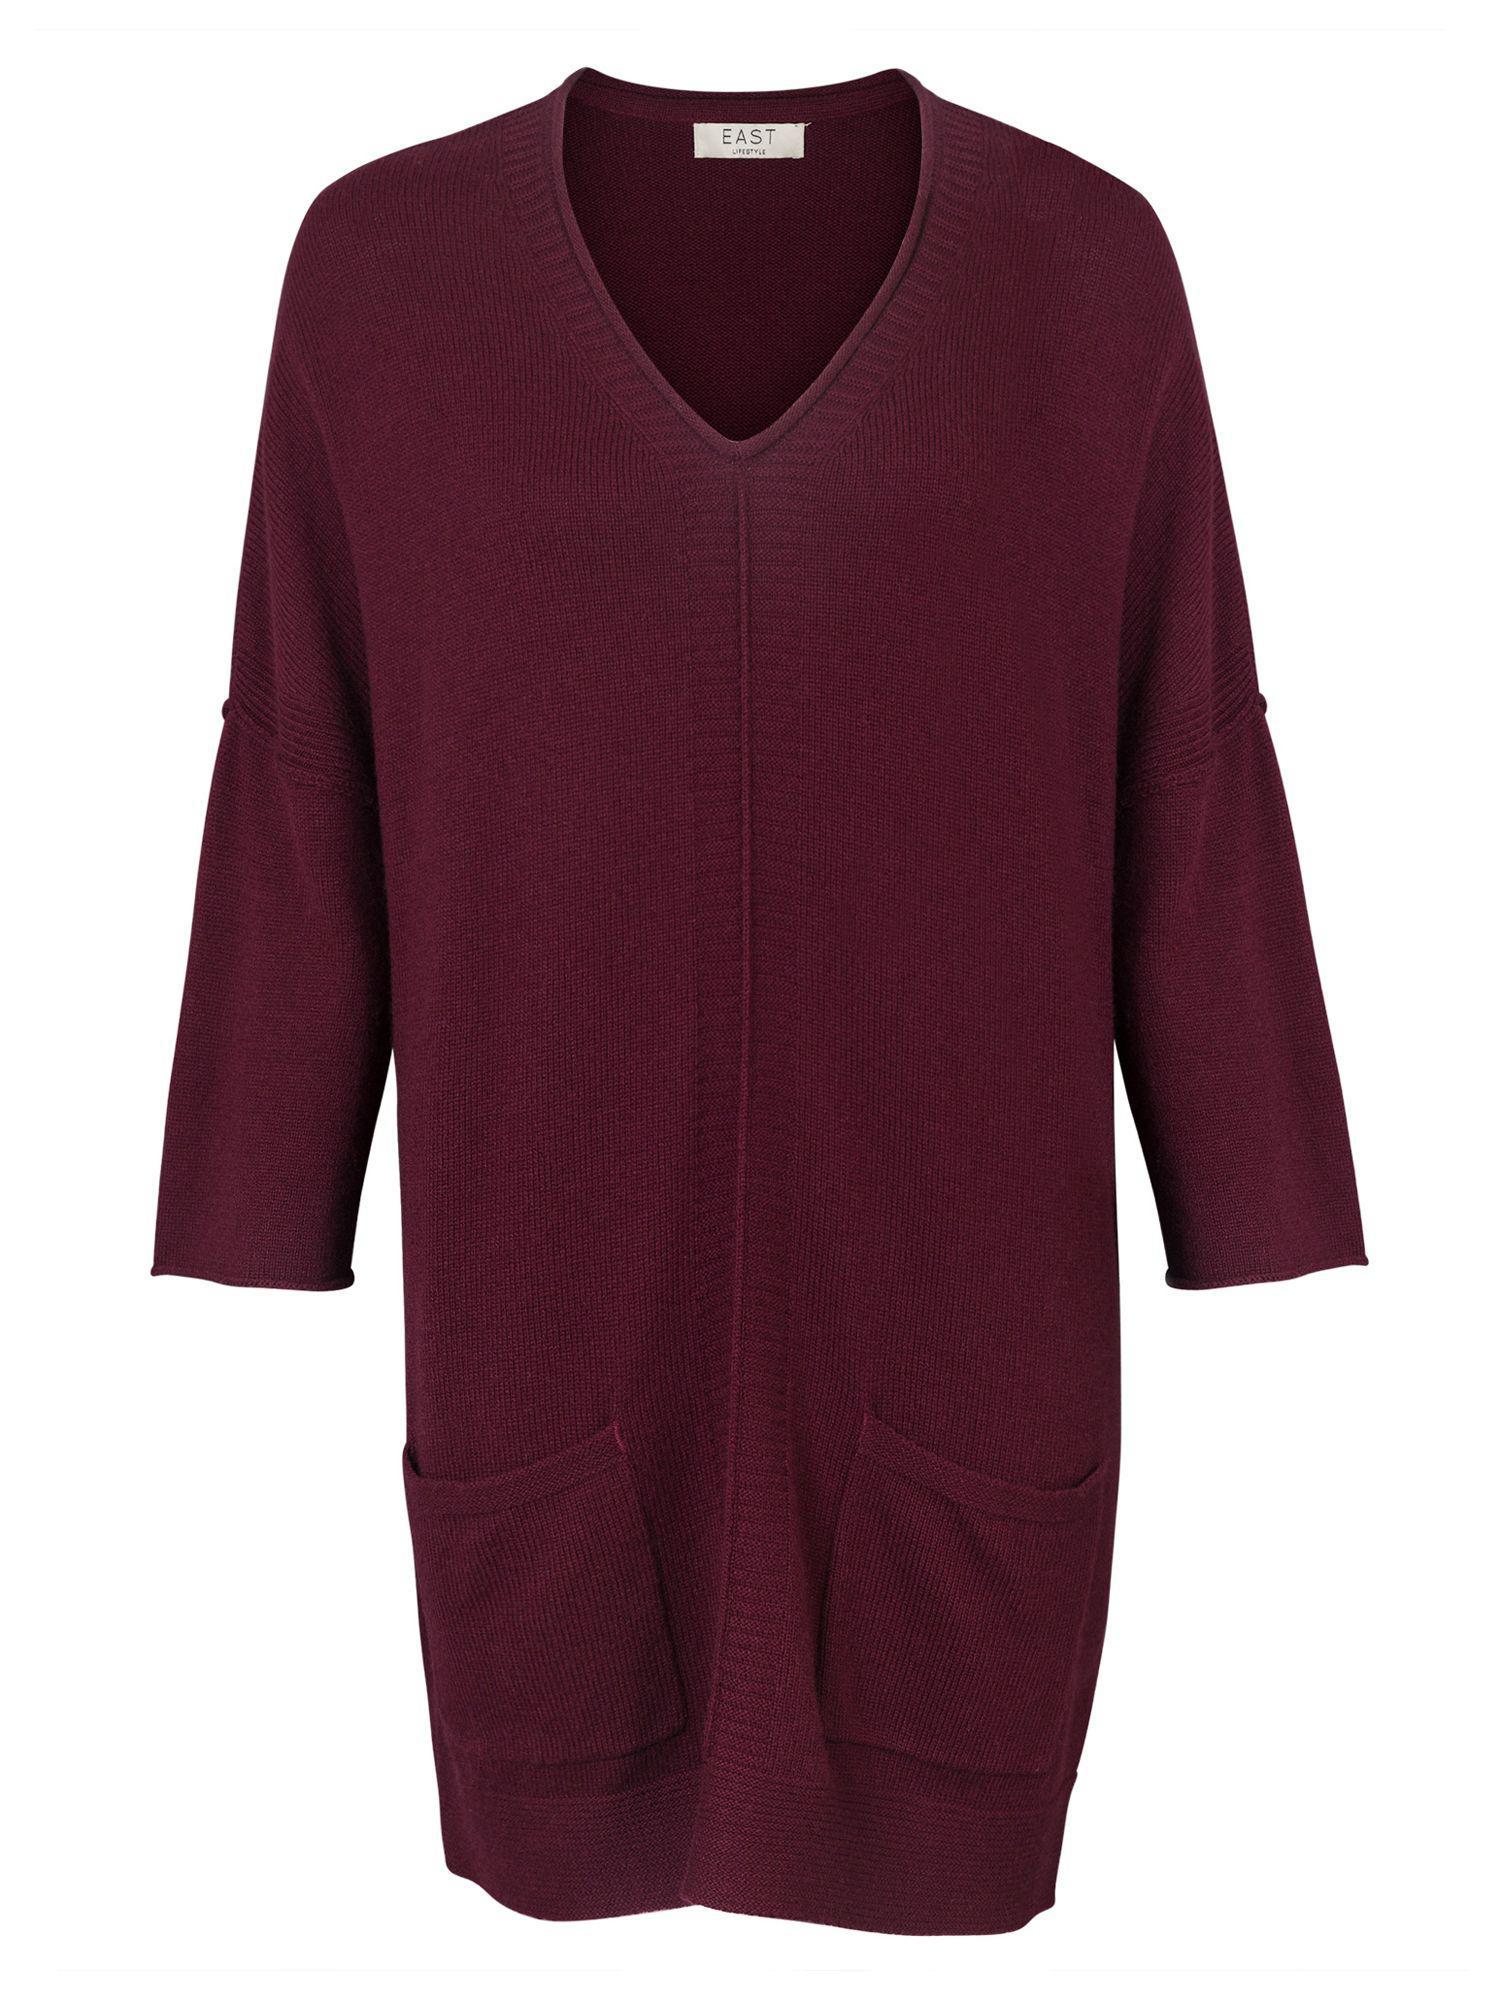 John Lewis Wool East V-neckline Tabard Top in Purple